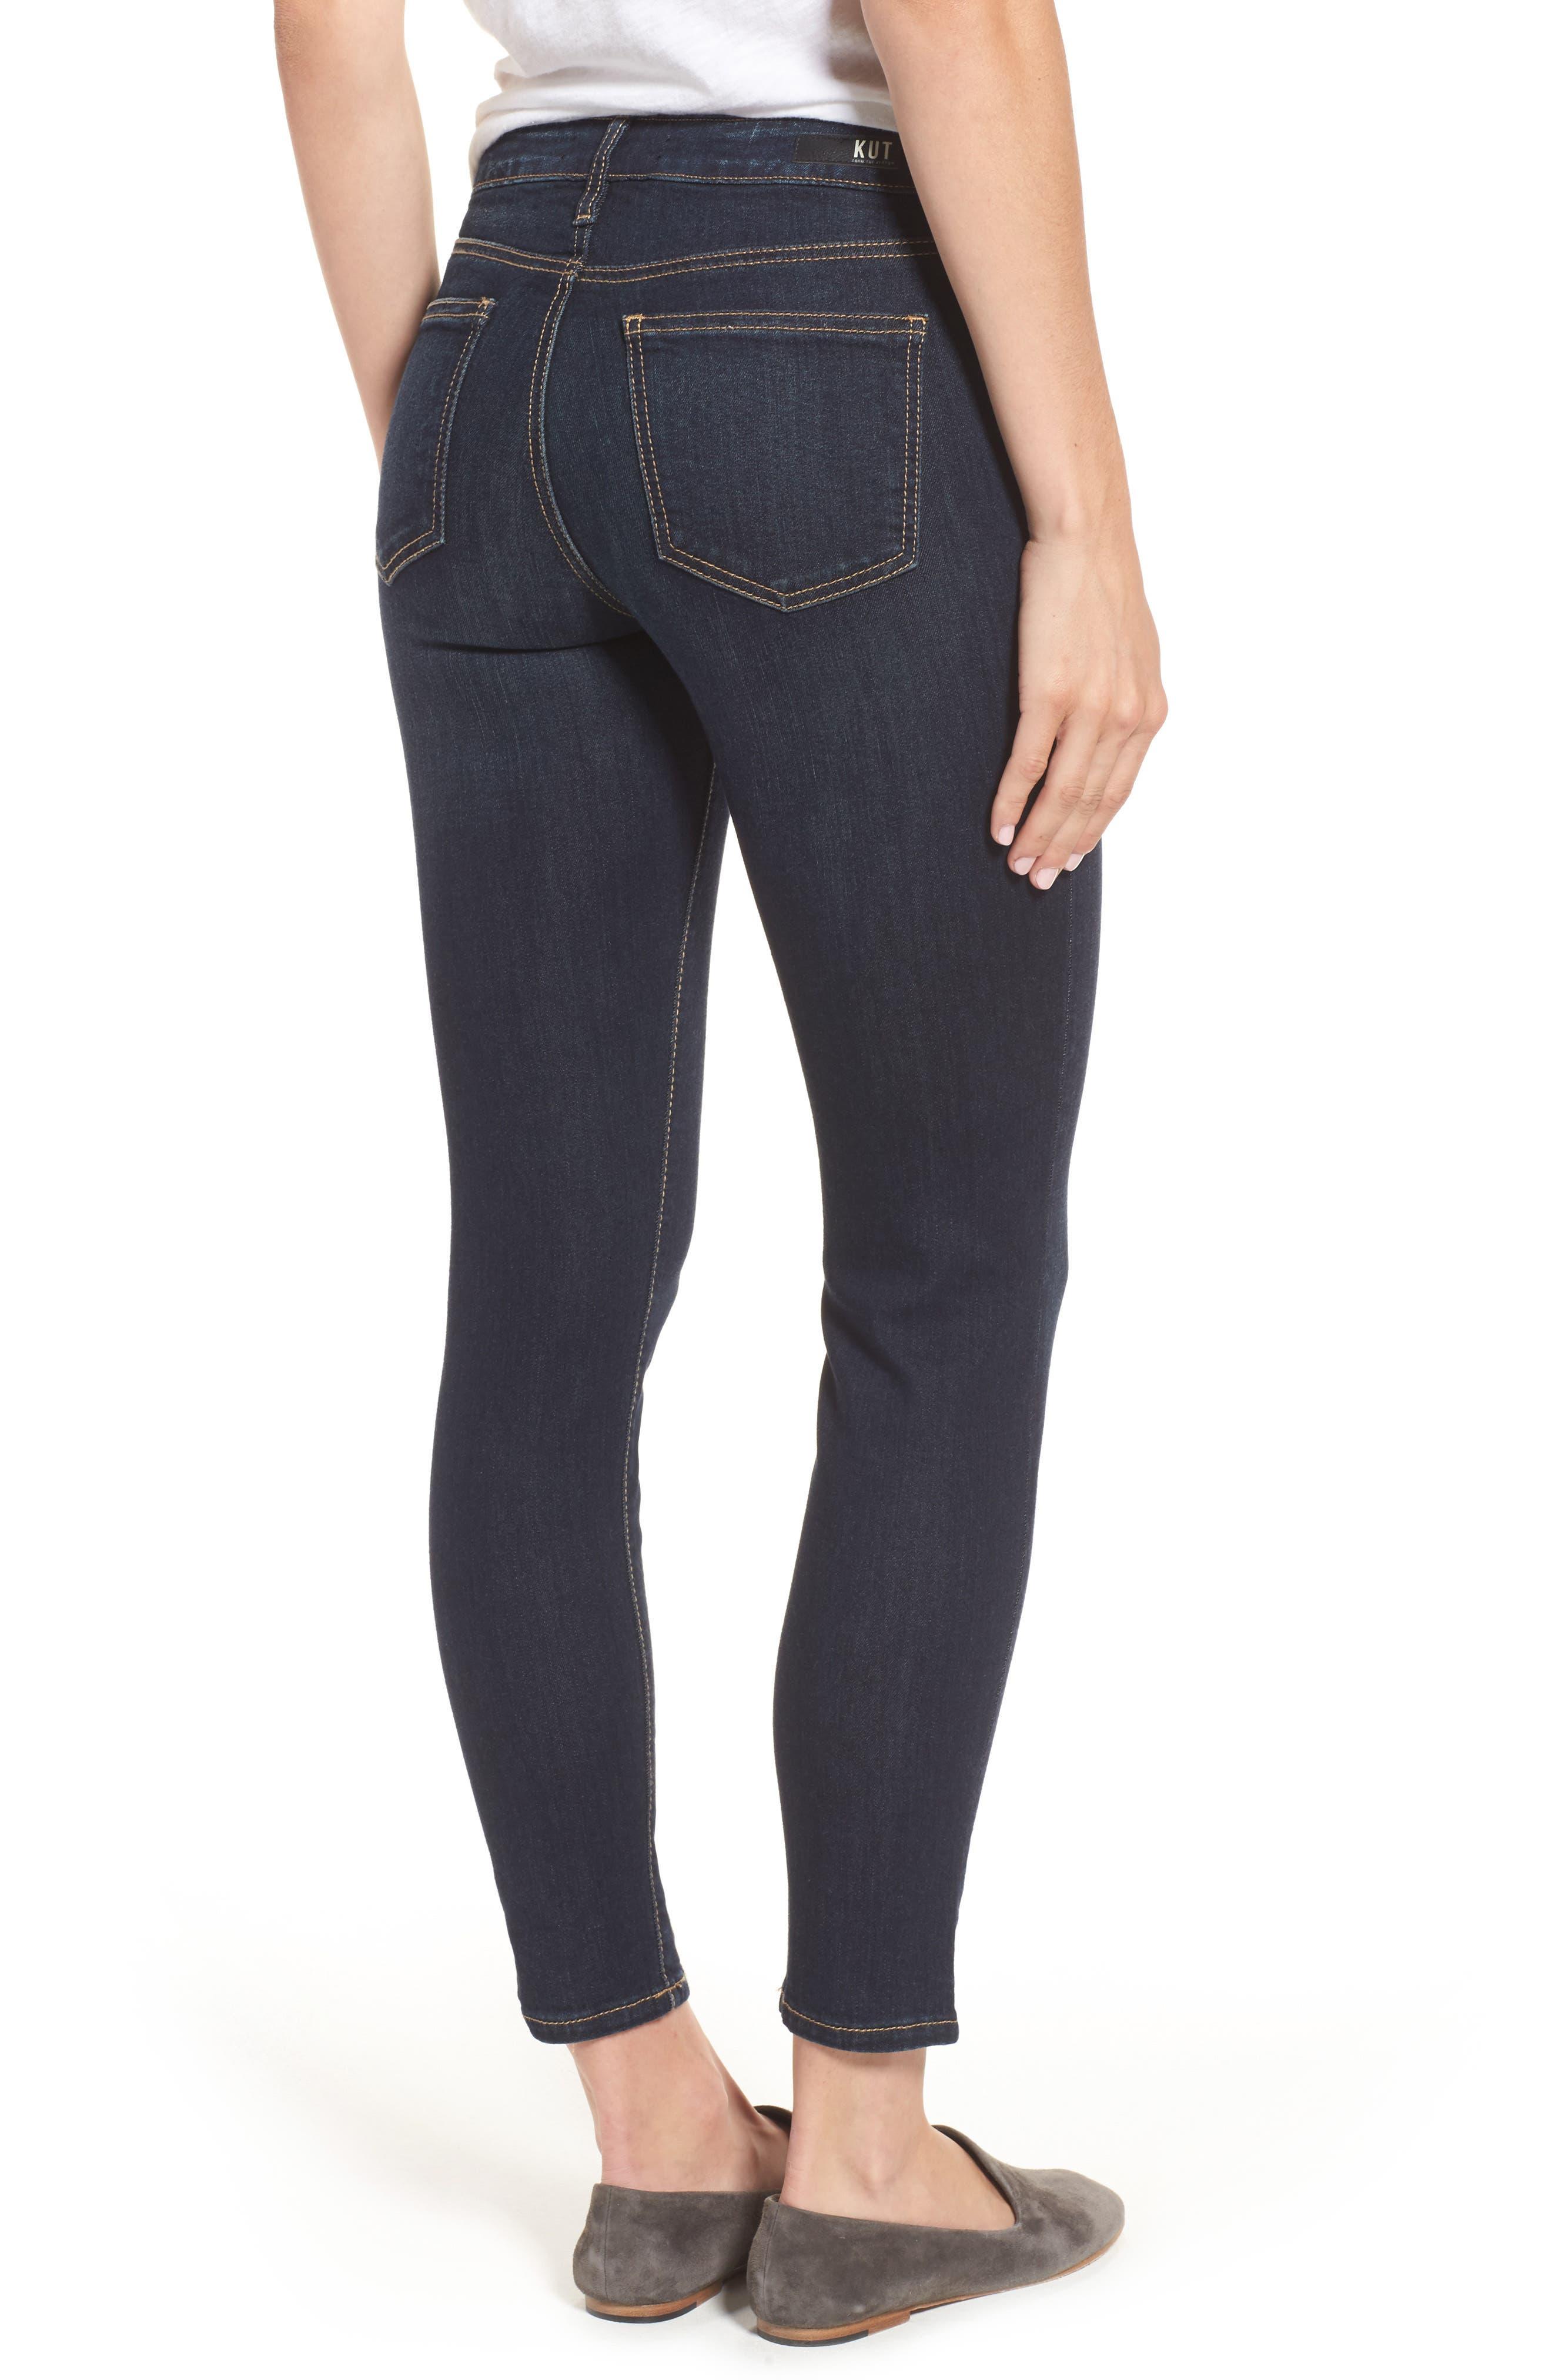 Diana Kurvy Stretch Ankle Jeans,                             Alternate thumbnail 2, color,                             490